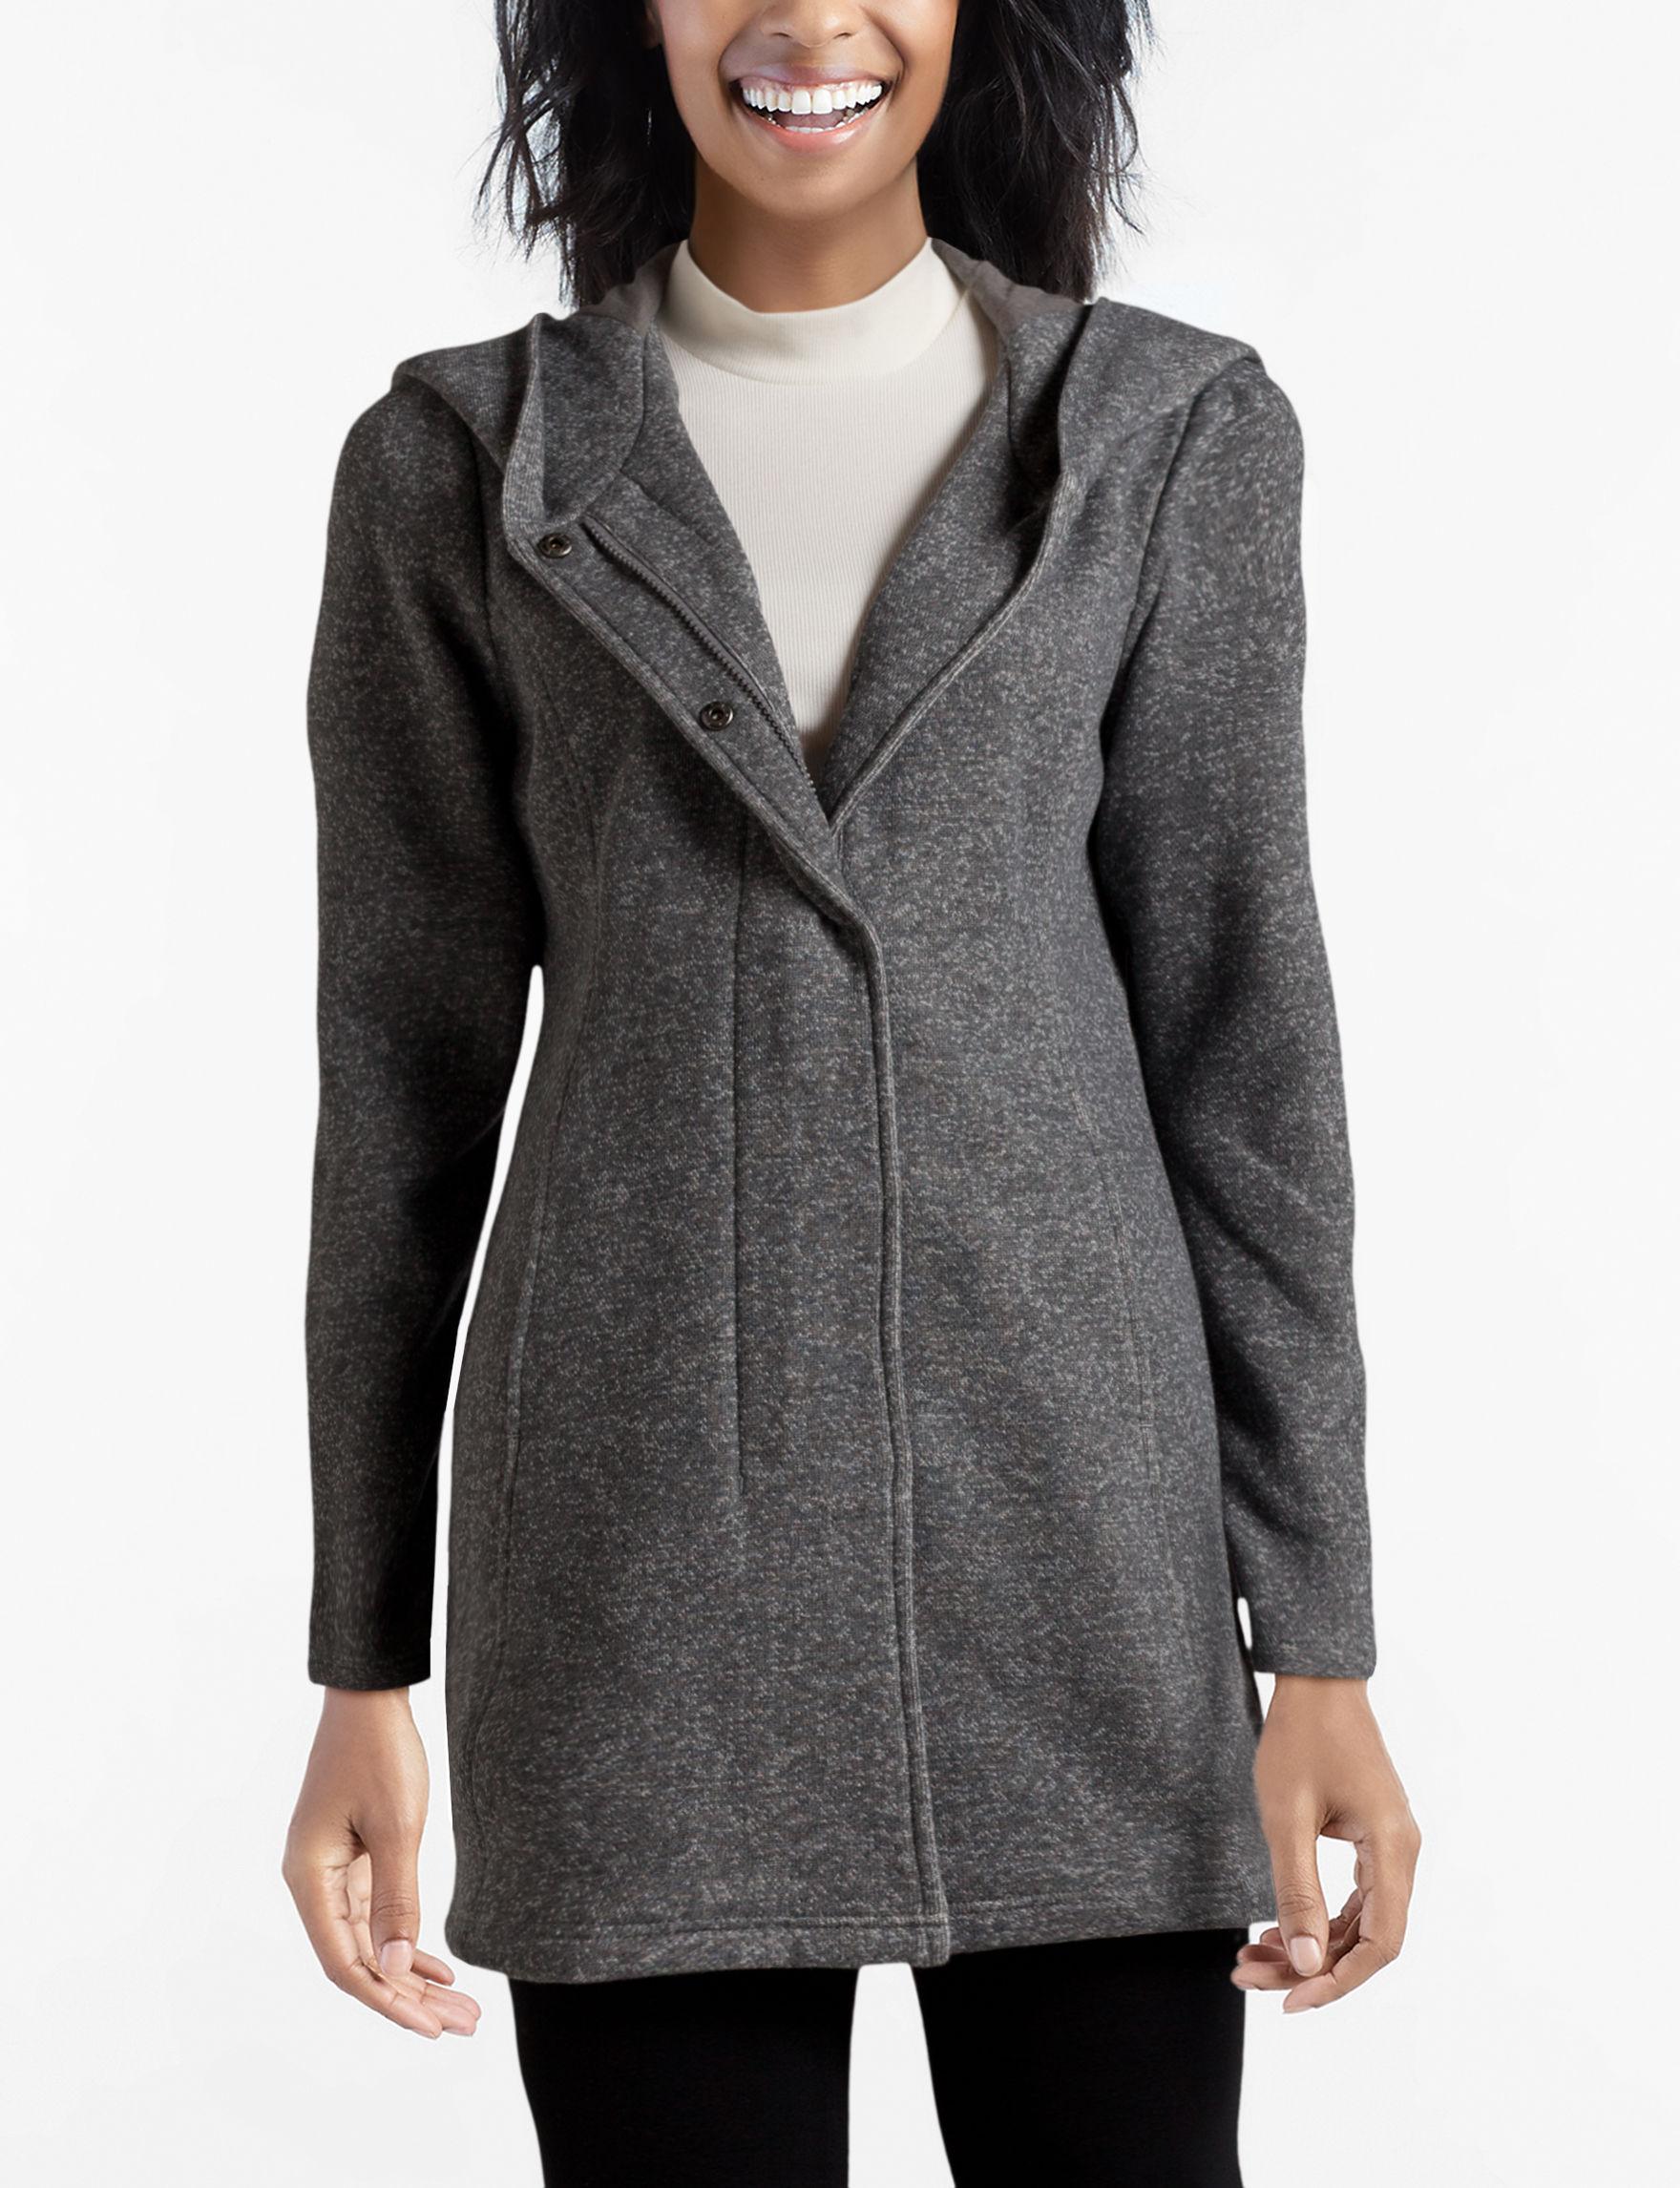 Valerie Stevens Charcoal Fleece & Soft Shell Jackets